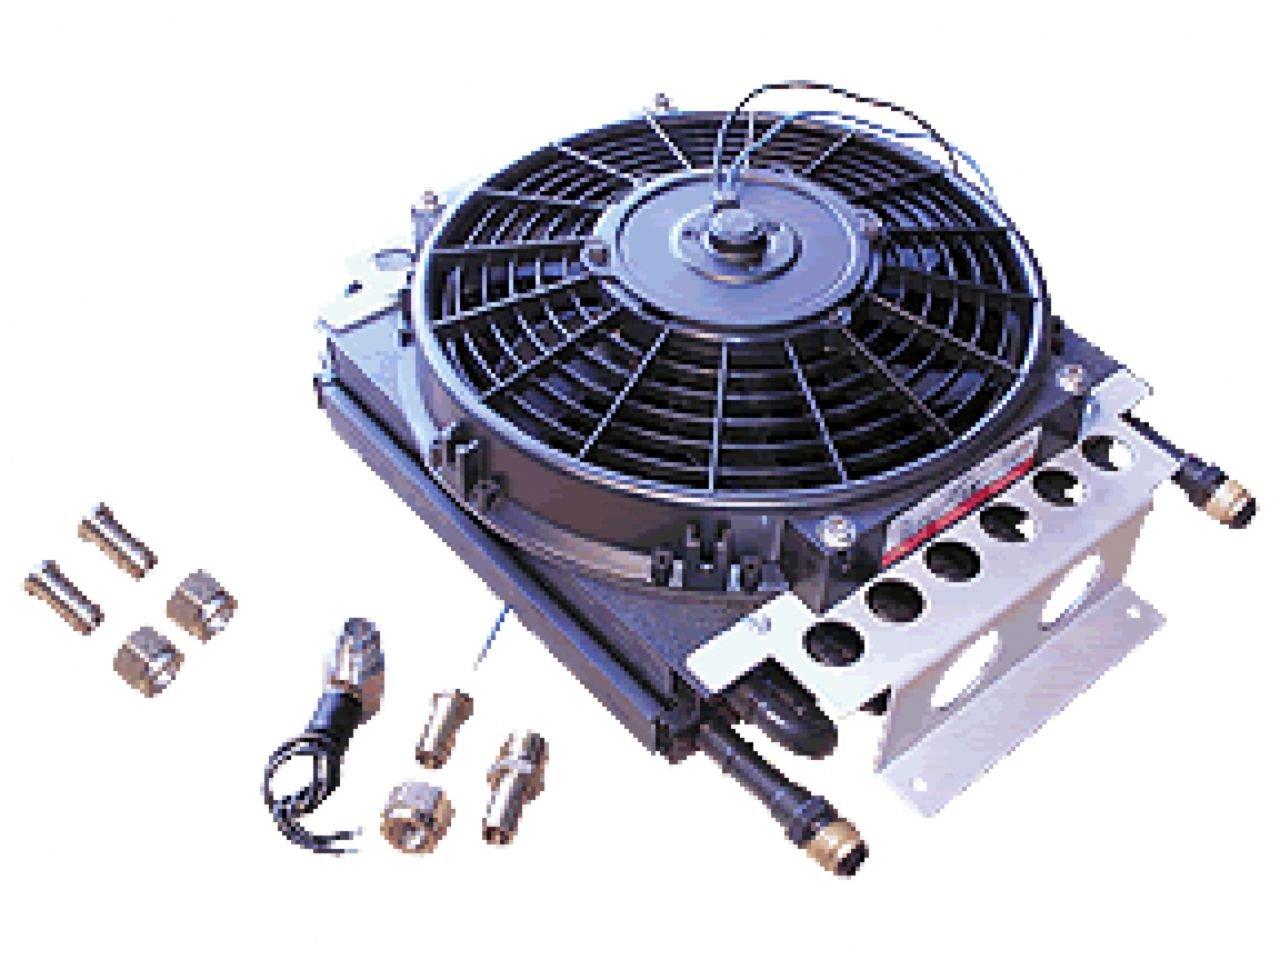 Ats Diesel 3109003000 Transmission Cooler Automotive Flexalite Electric Fan Black Magic Series Coximportcom A